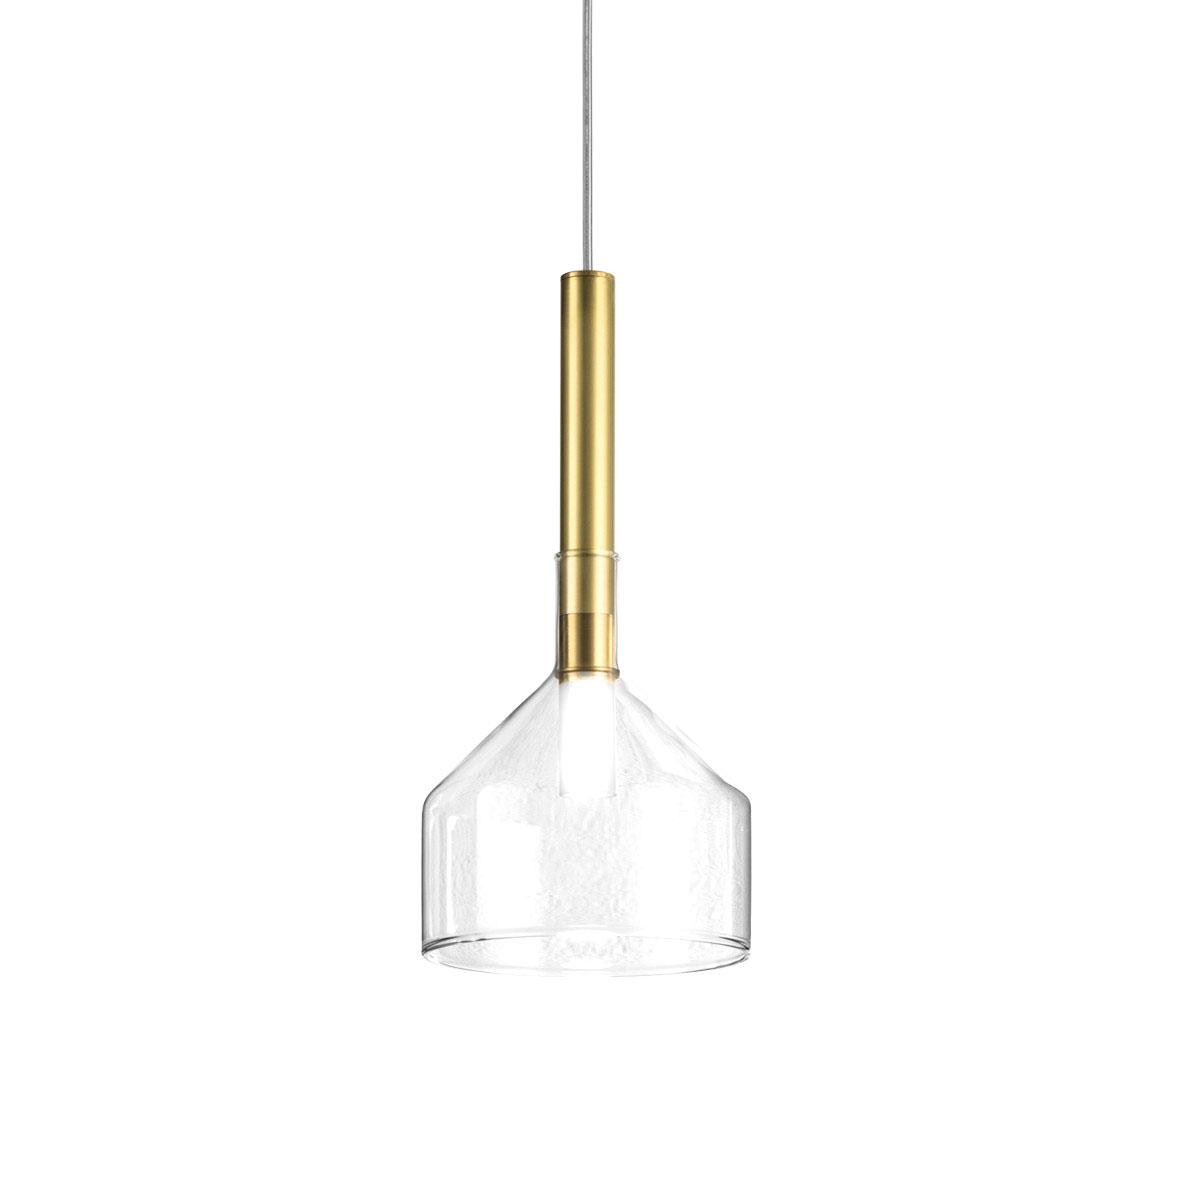 Alchimia Lampe 277.02